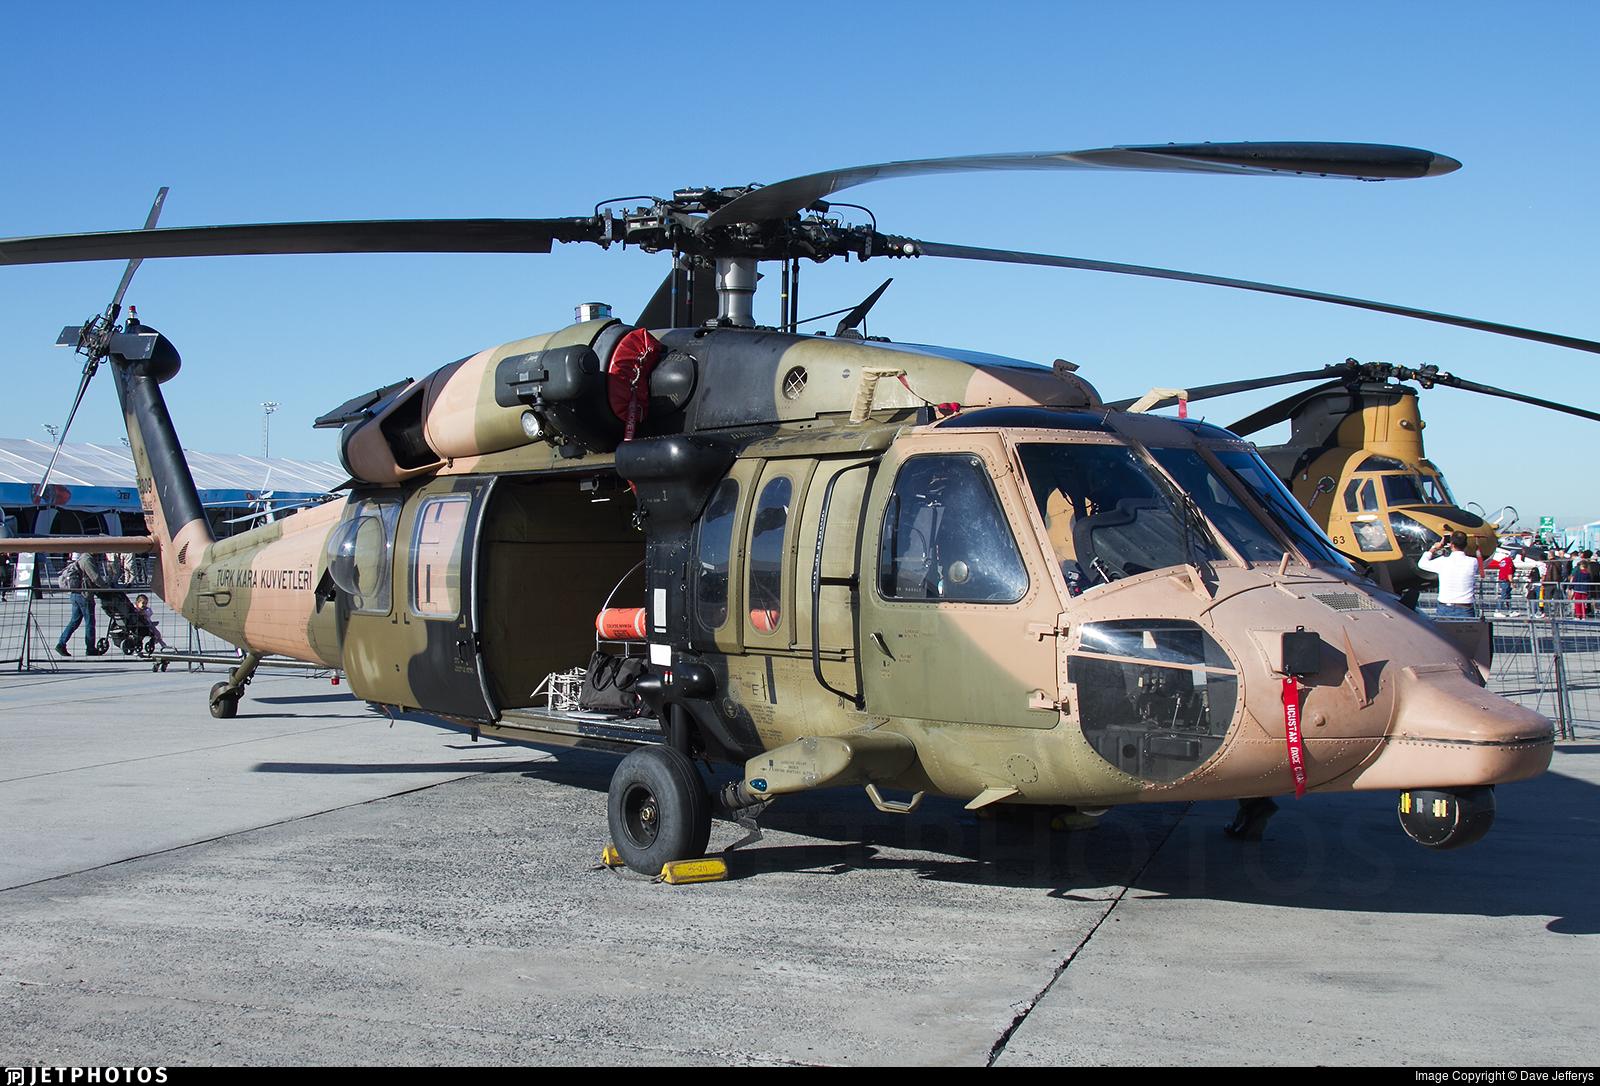 12309 - Sikorsky S-70A-28 Blackhawk - Turkey - Army